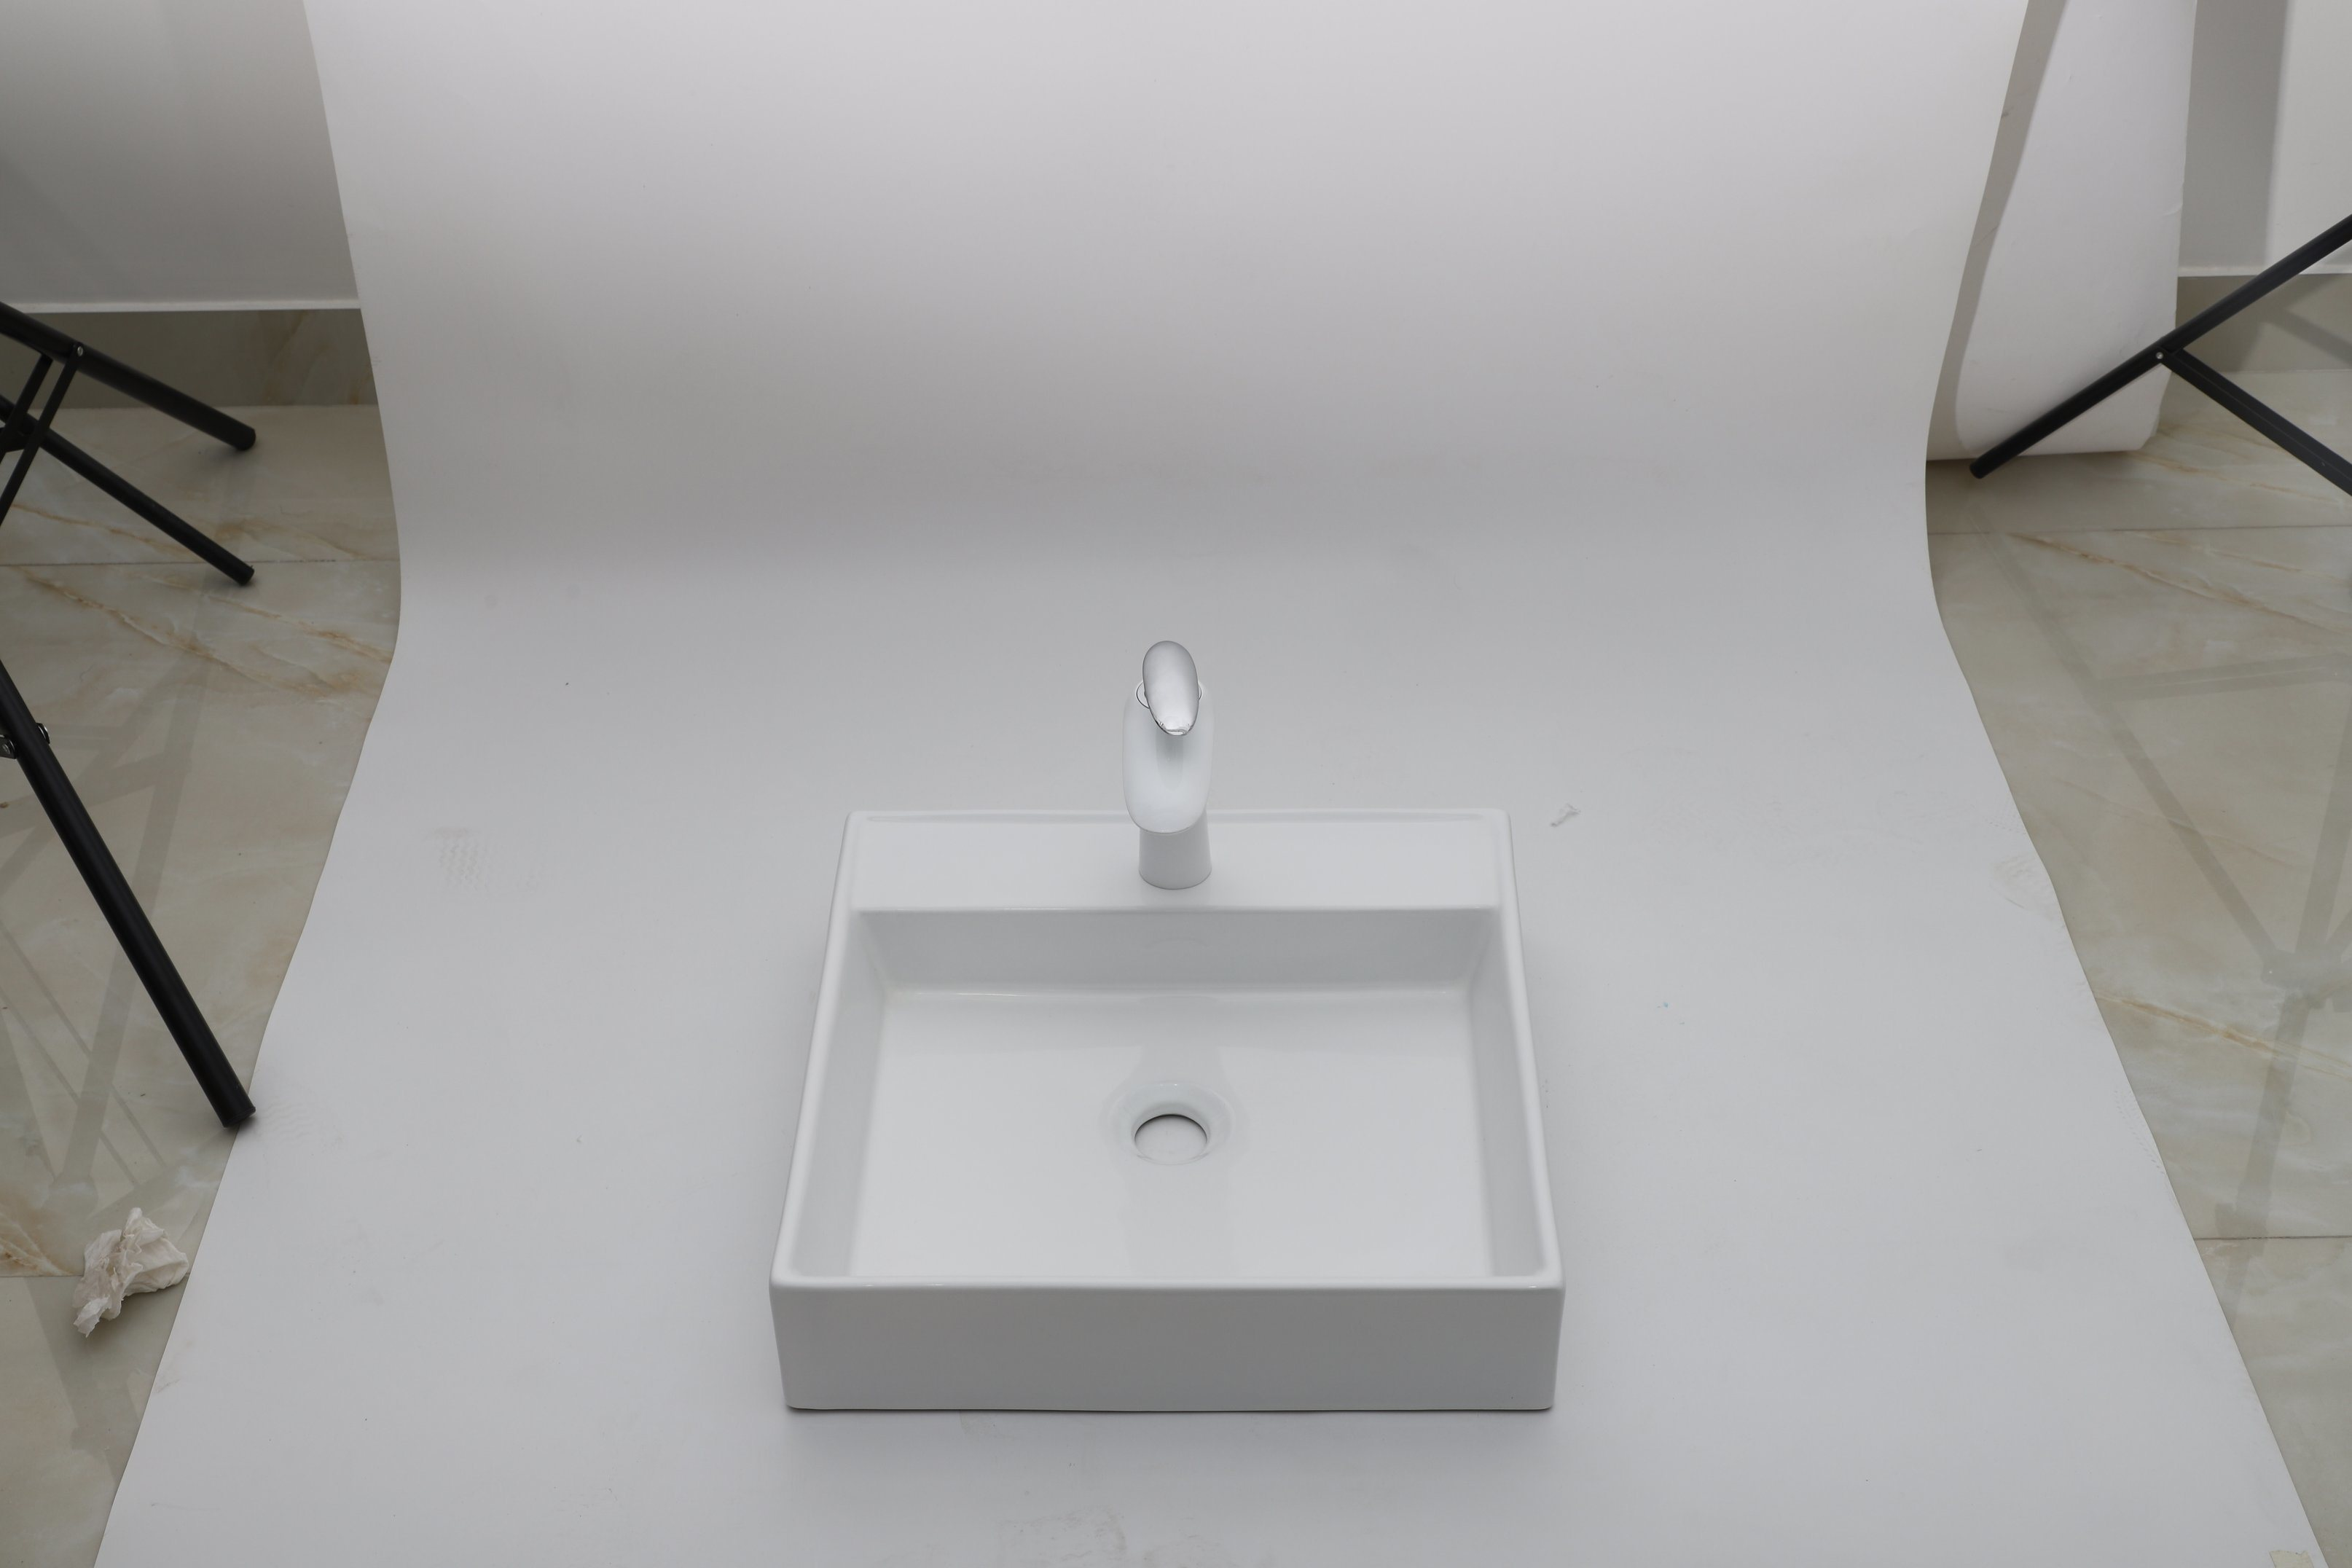 Amb1317 Hot White Bathroom Sink